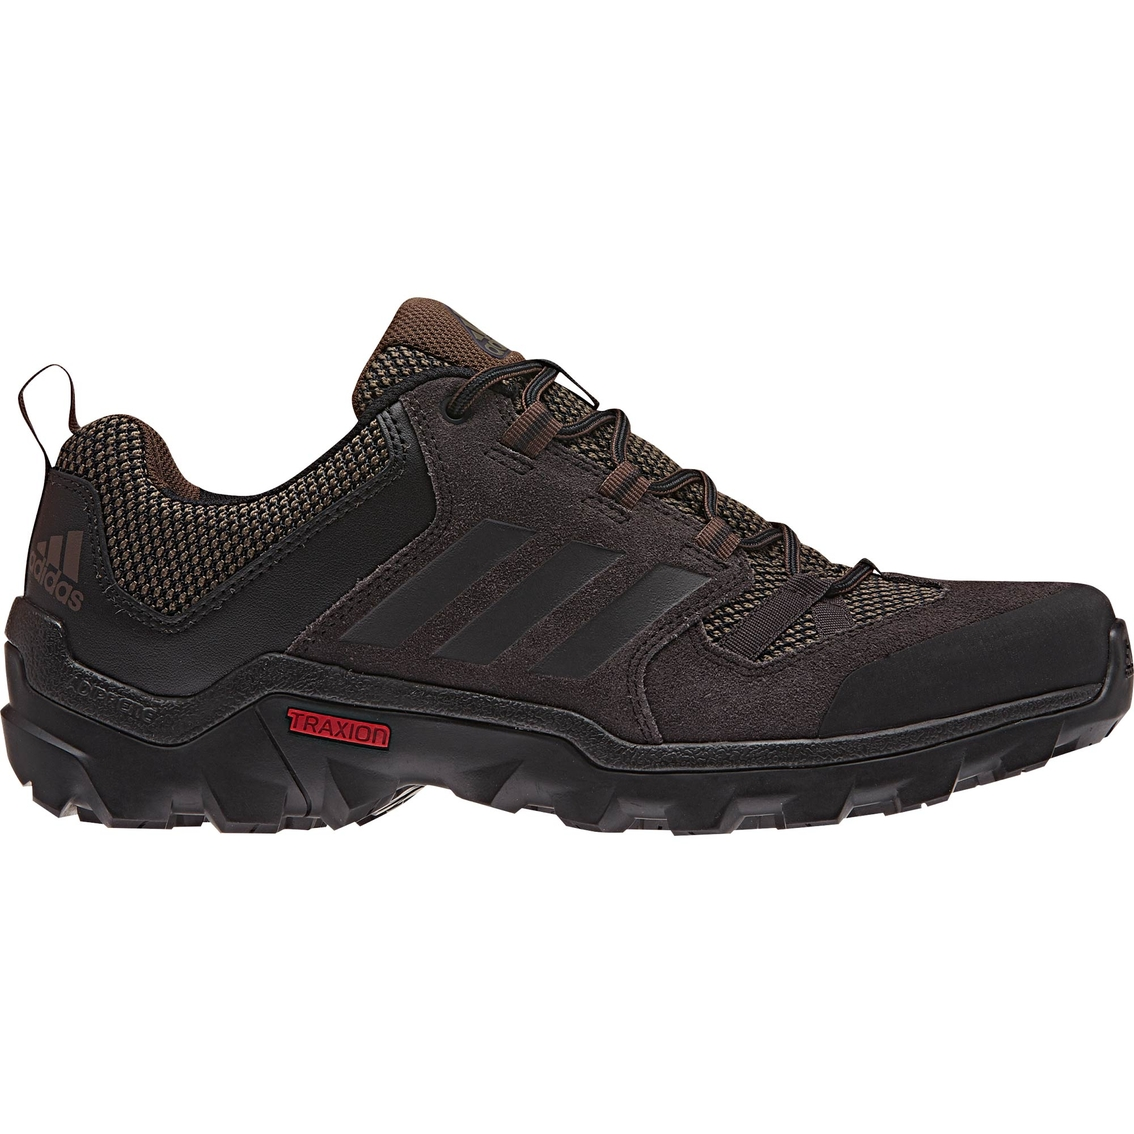 Caprock Trail Hiking Shoes | Hiking